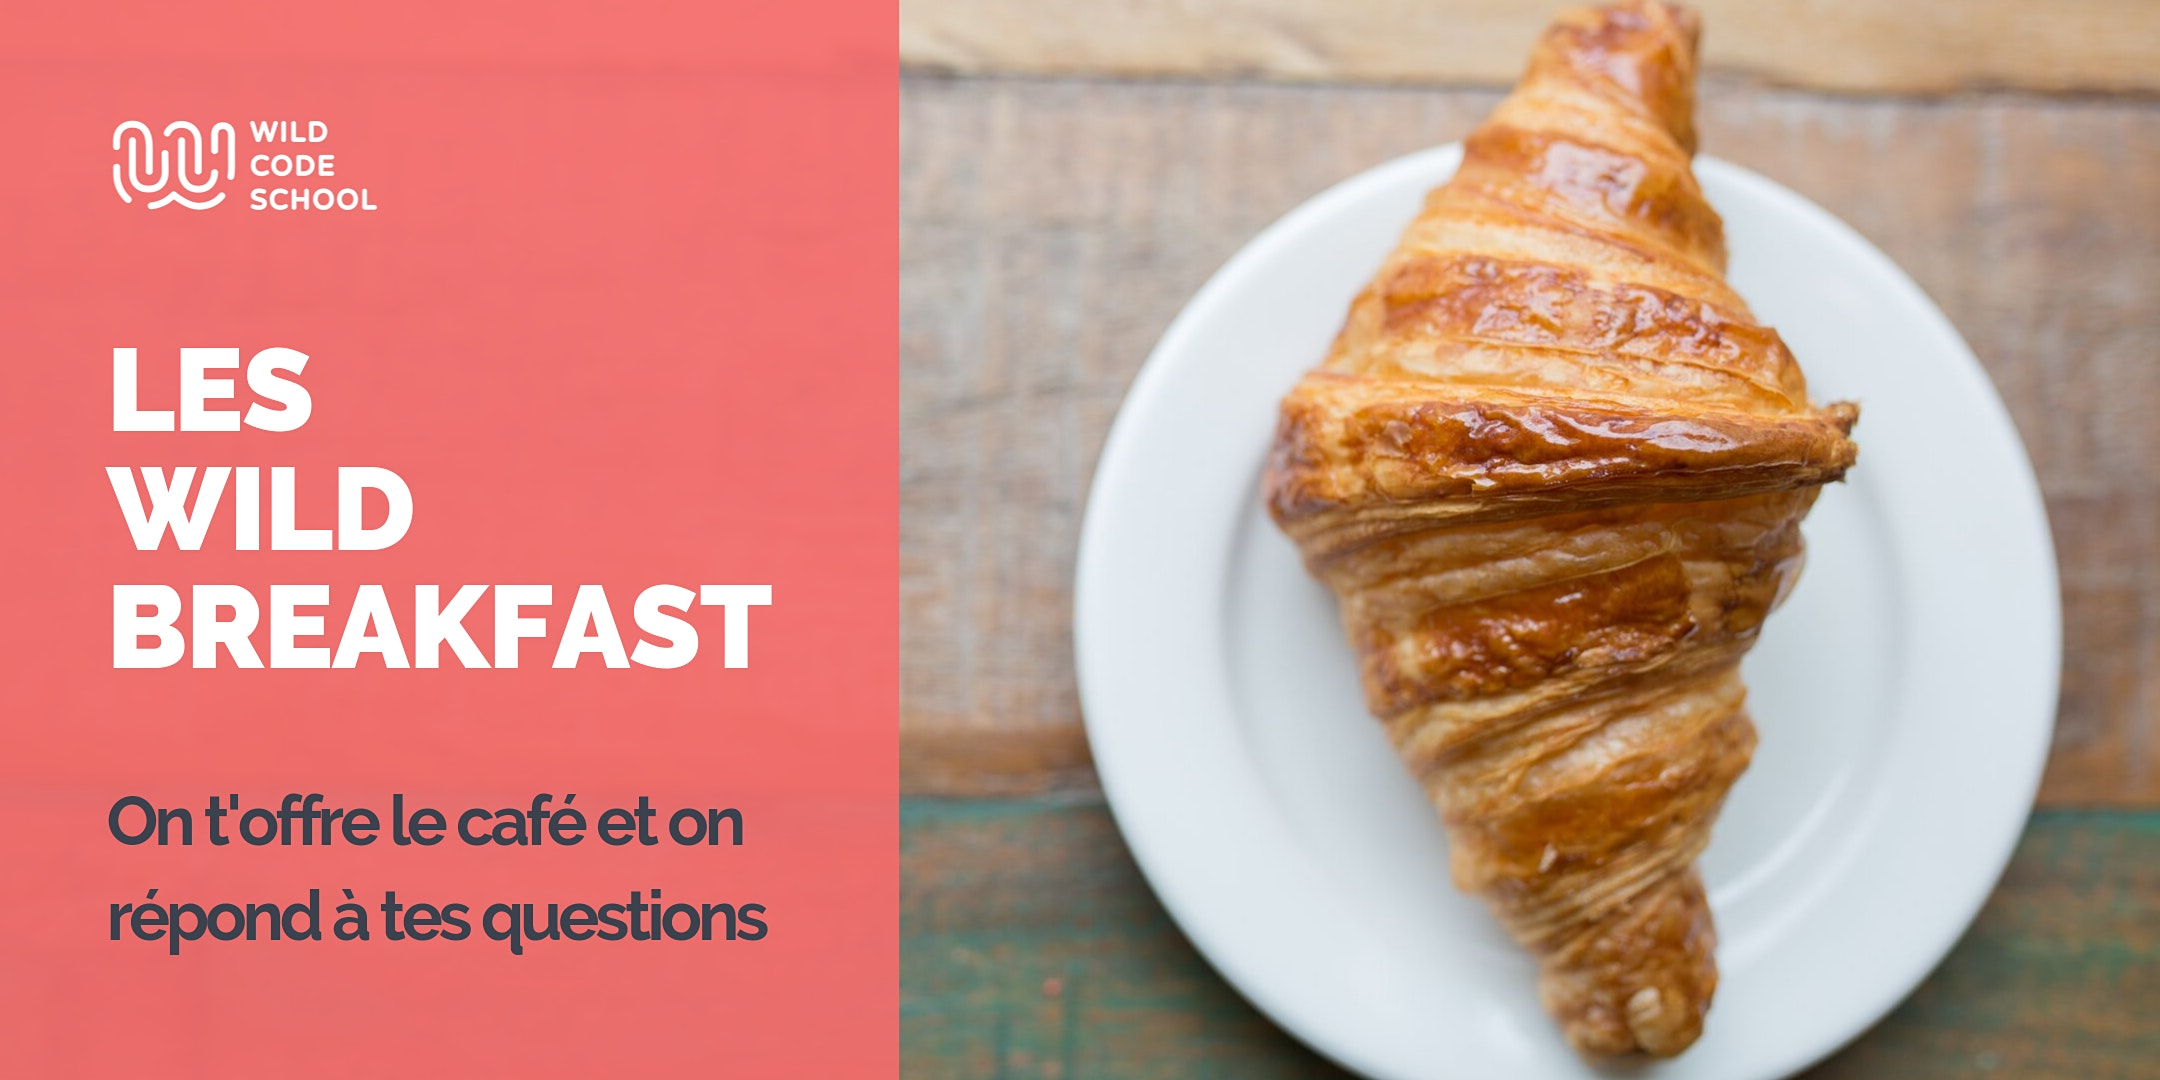 Wild Breakfast - Présentation Ecole & Formations - Wild Code School Nantes